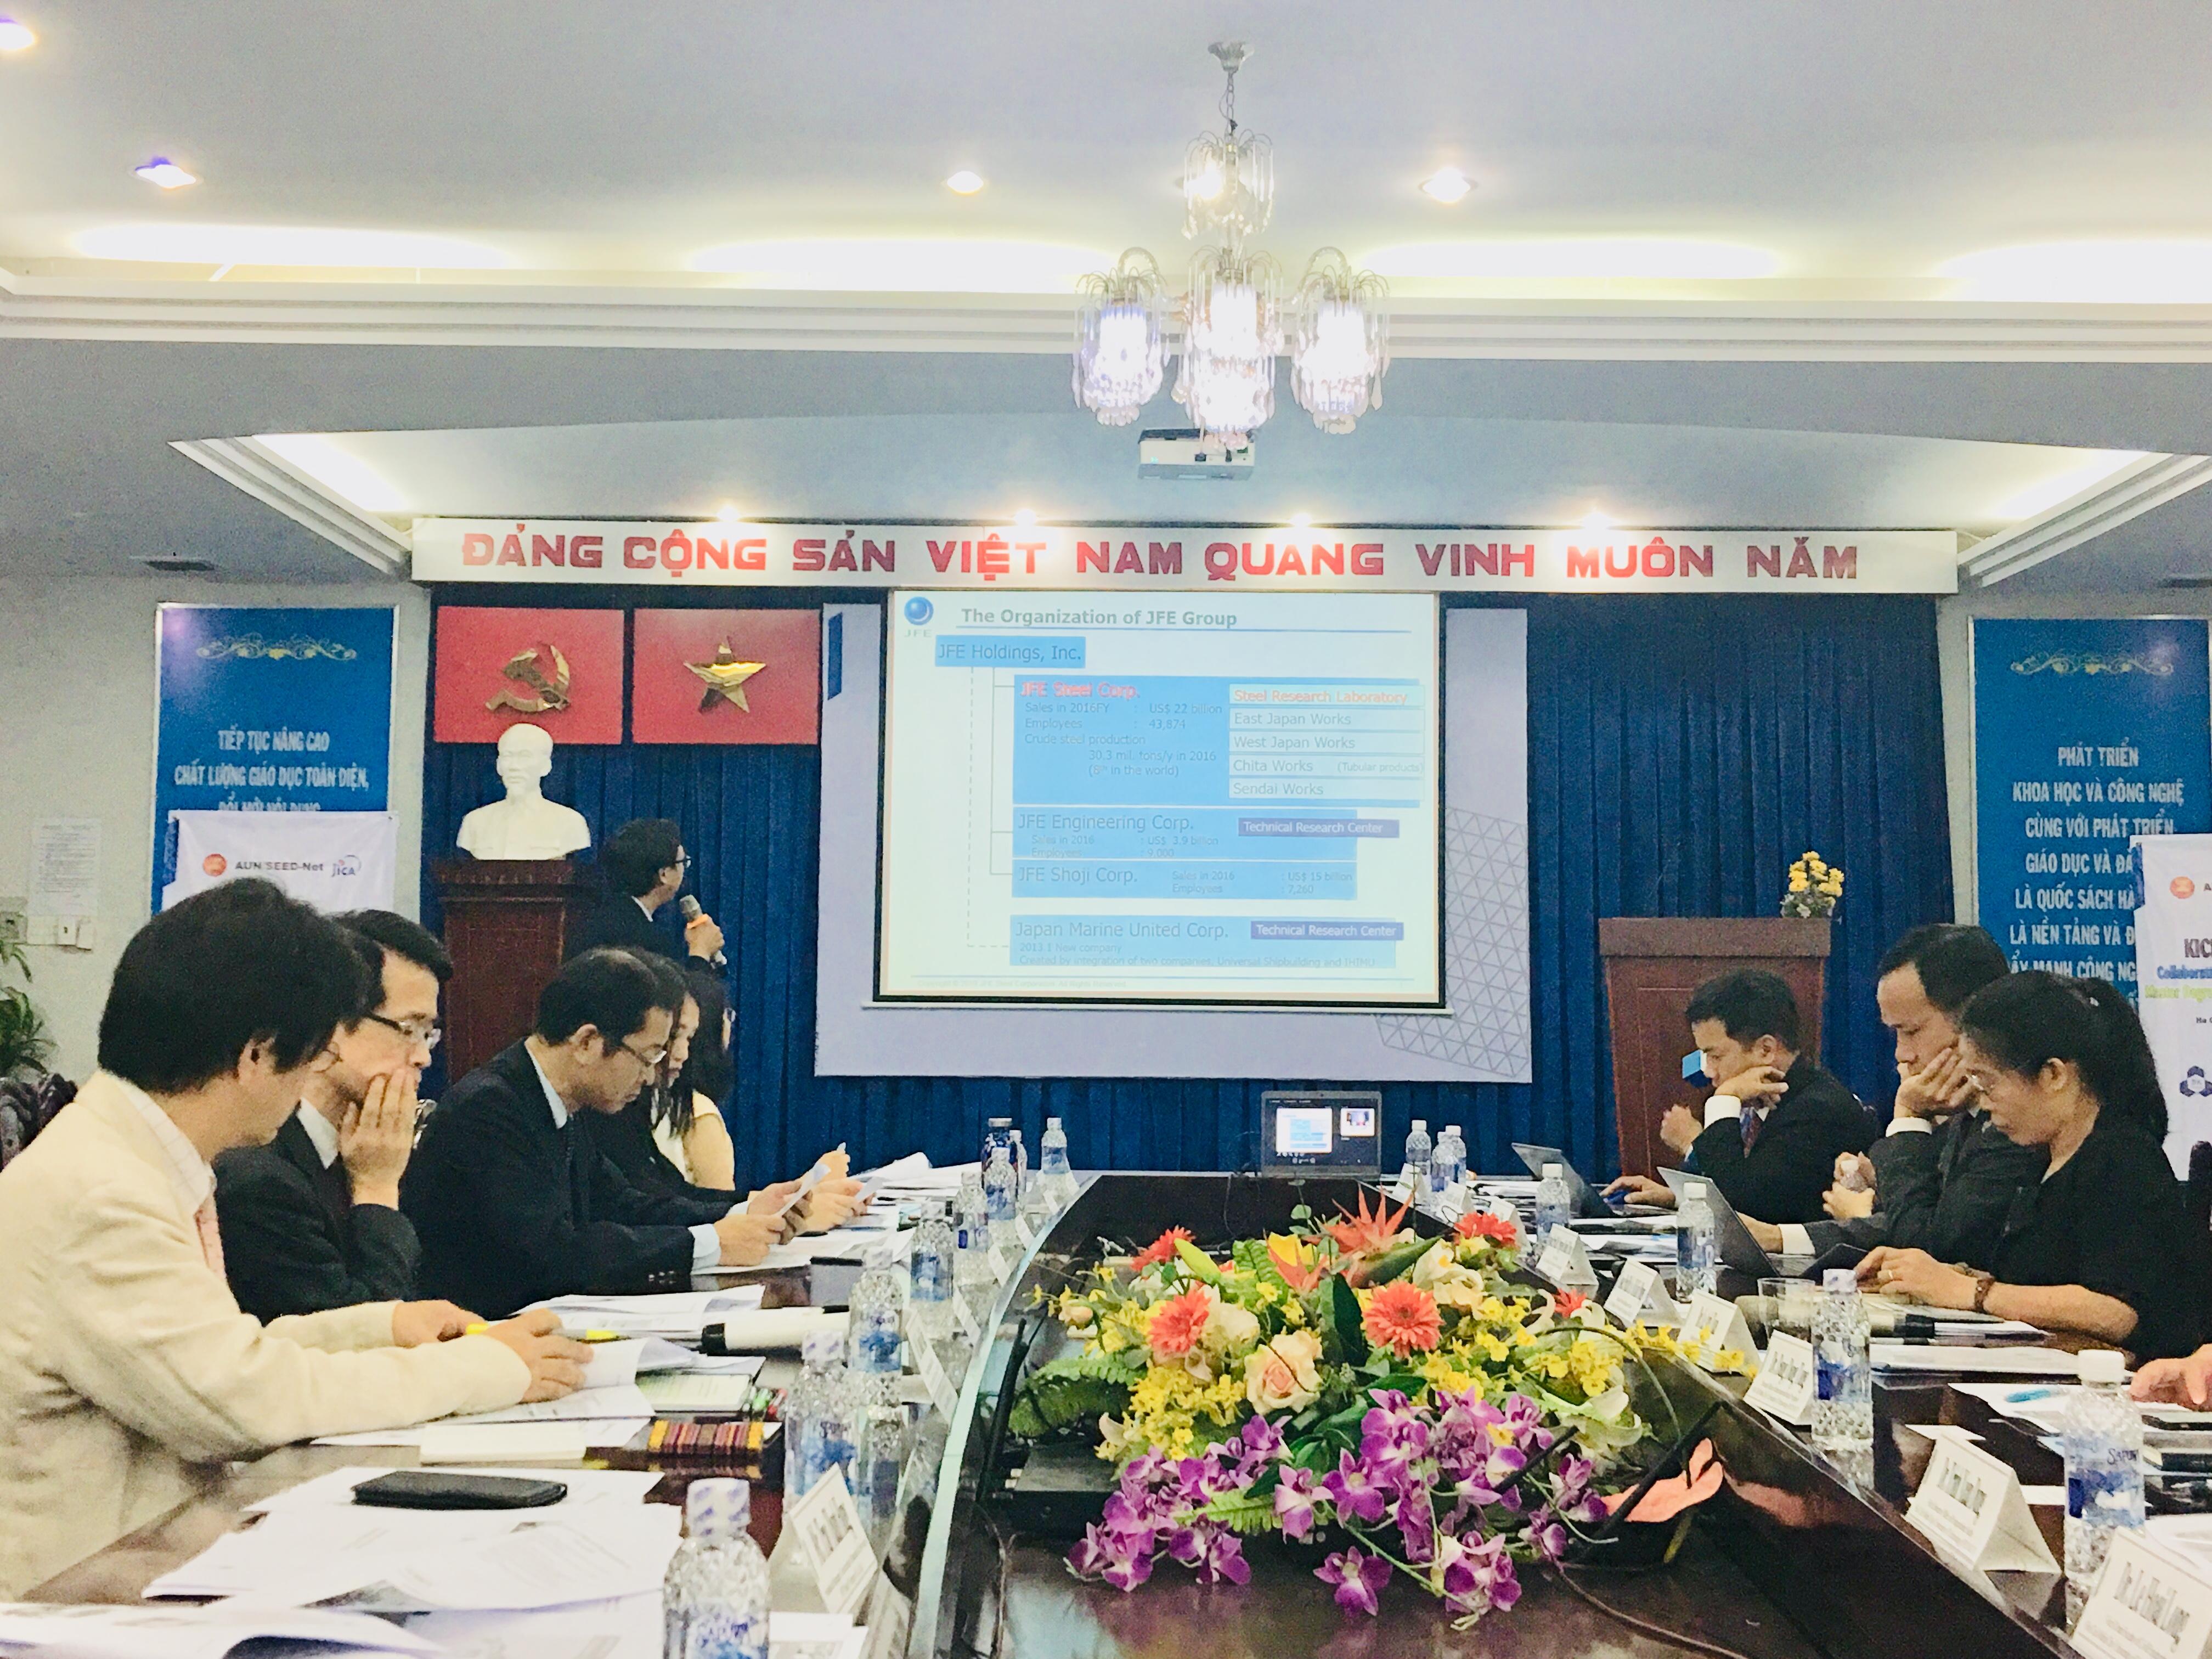 JFE Steel Company Limited presentation CEP Kick off meeting HCMUT Bach khoa YNU YTU JFE